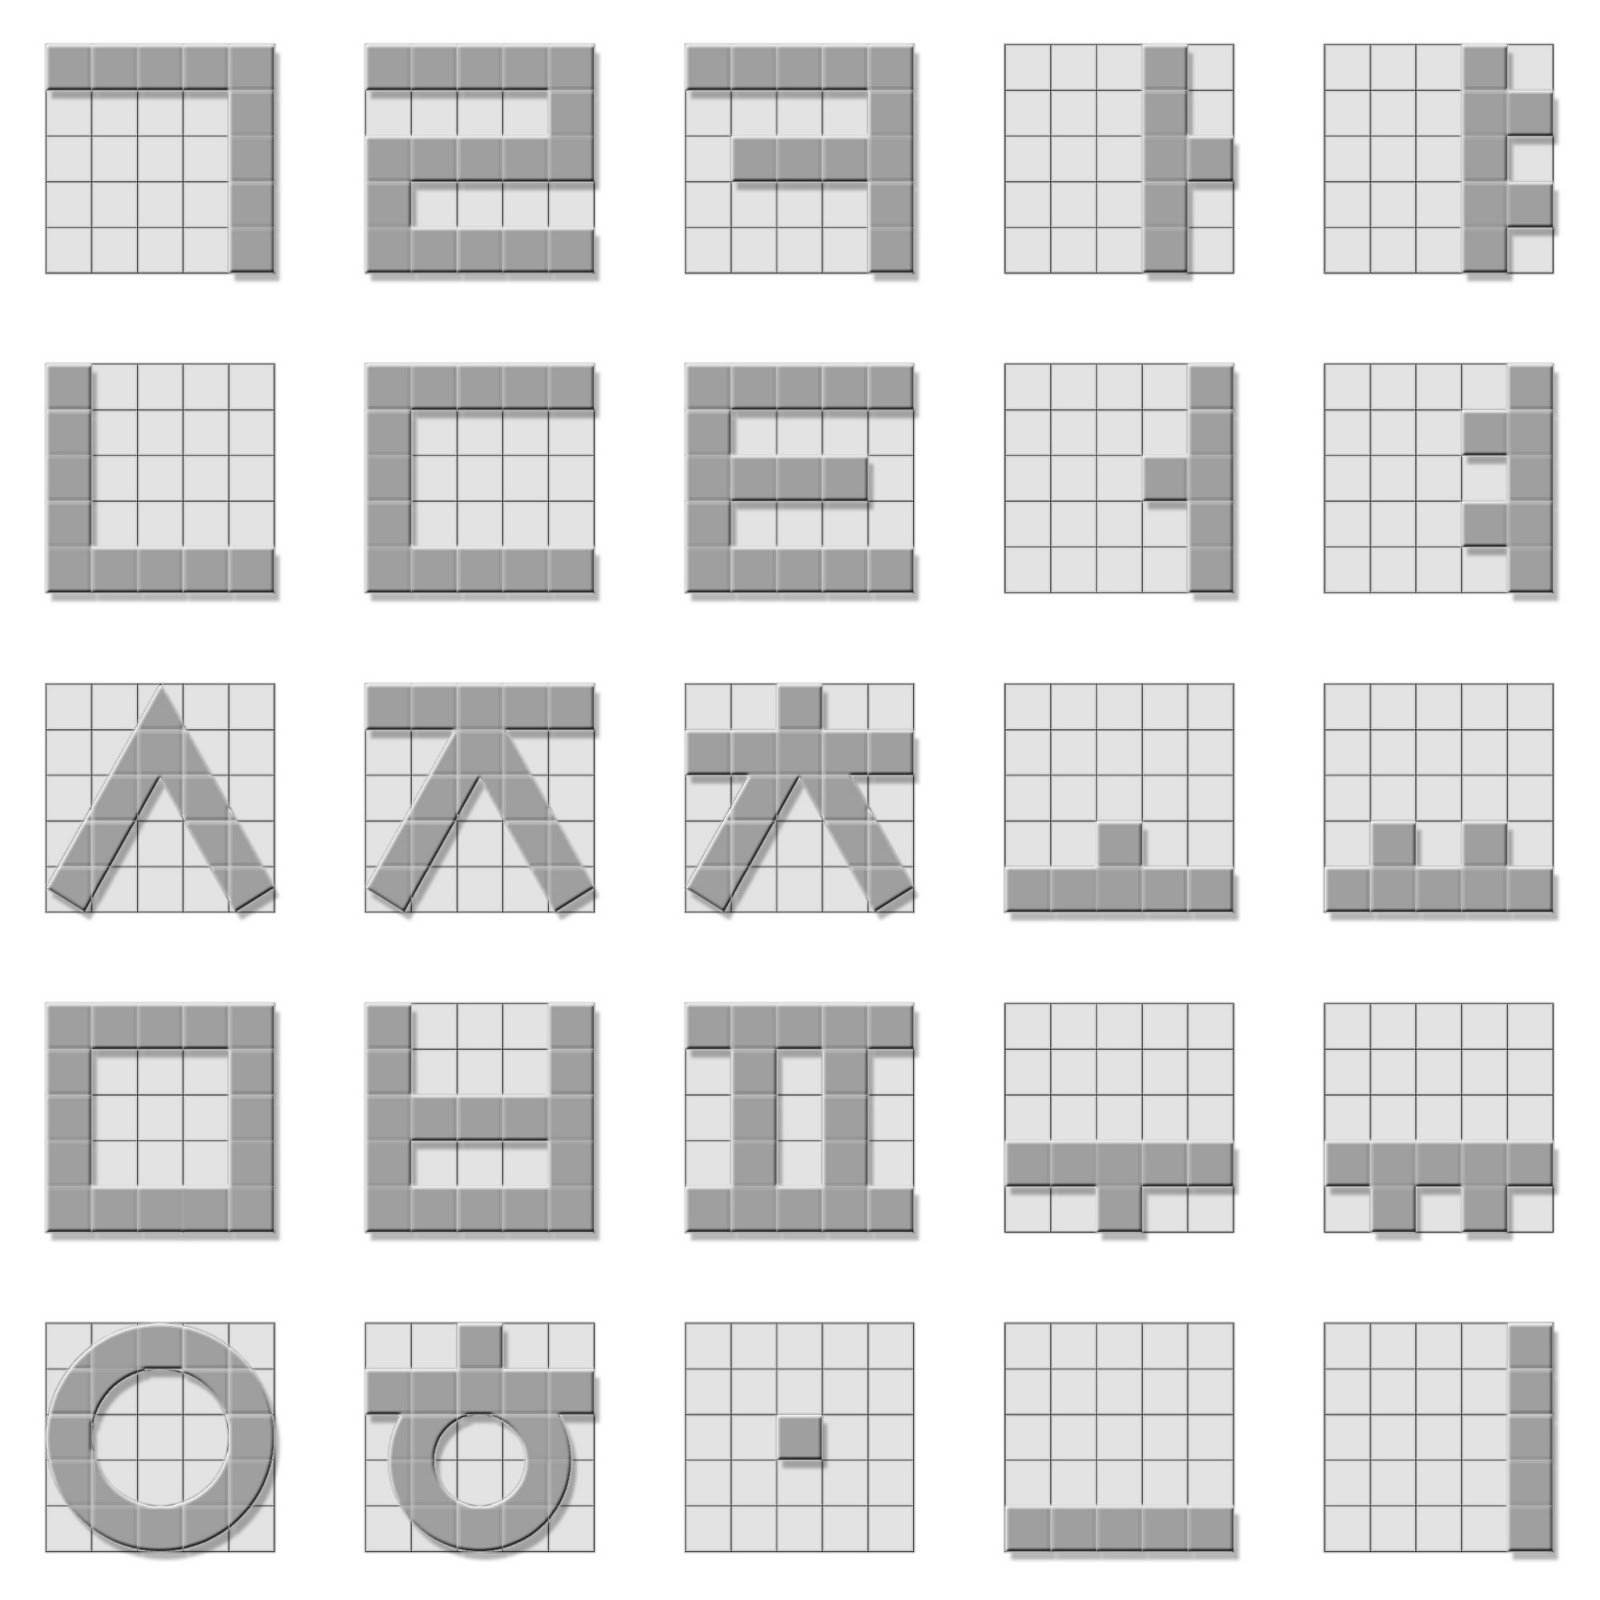 A Geek's Eye View: Korean Alphabet